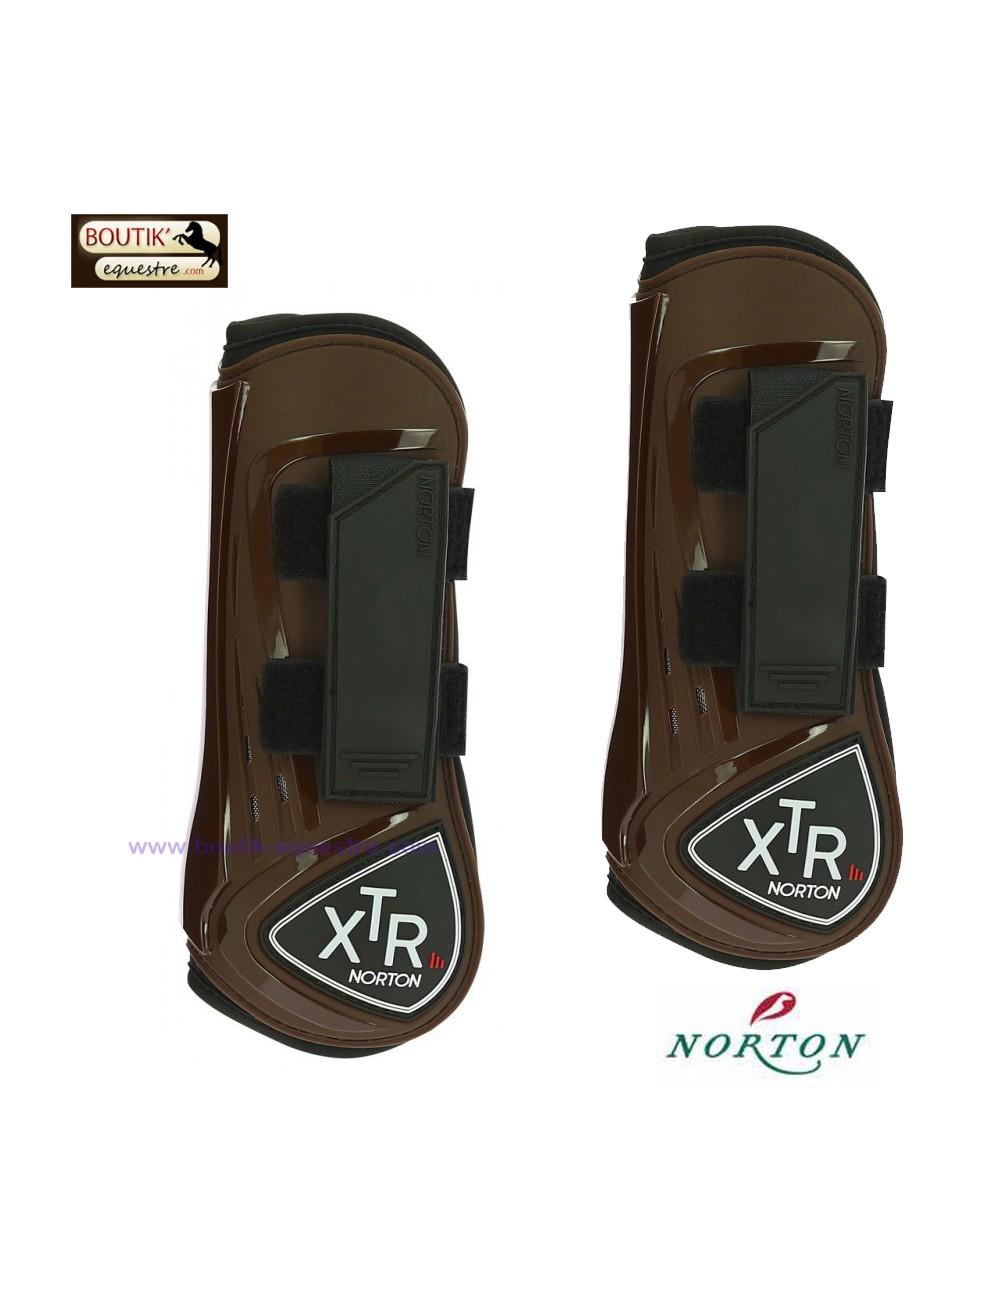 Guêtres NORTON XTR